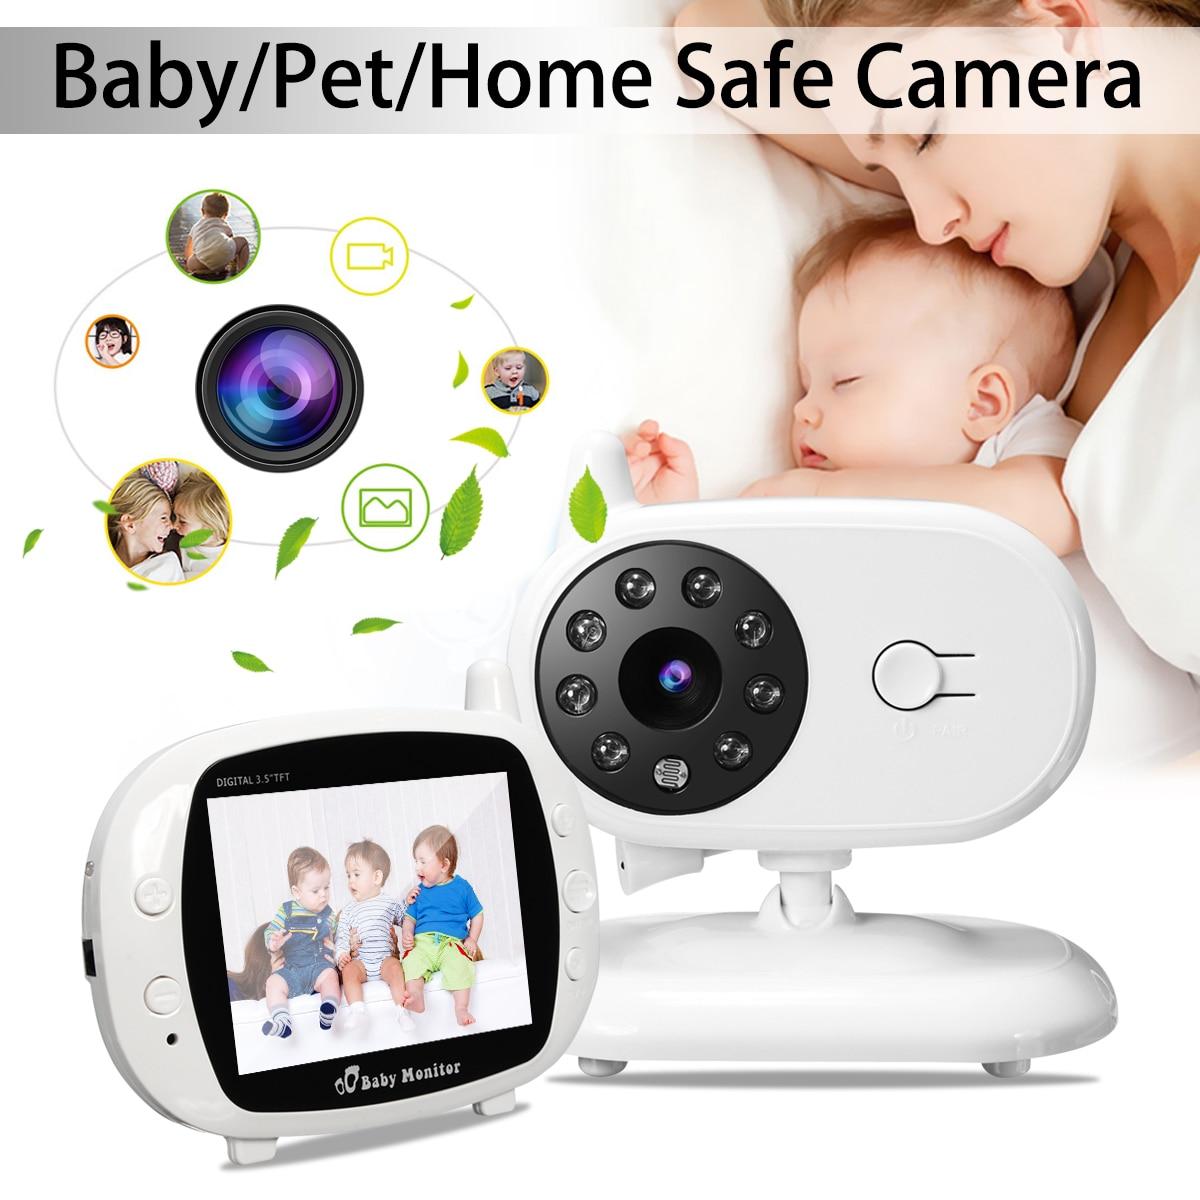 2,4G беспроводной цифровой ЖК-монитор для детей, 3,5 дюйма, камера, двусторонняя аудиосвязь, видео, ночное видение, Wi-Fi, няня, температура безопа...